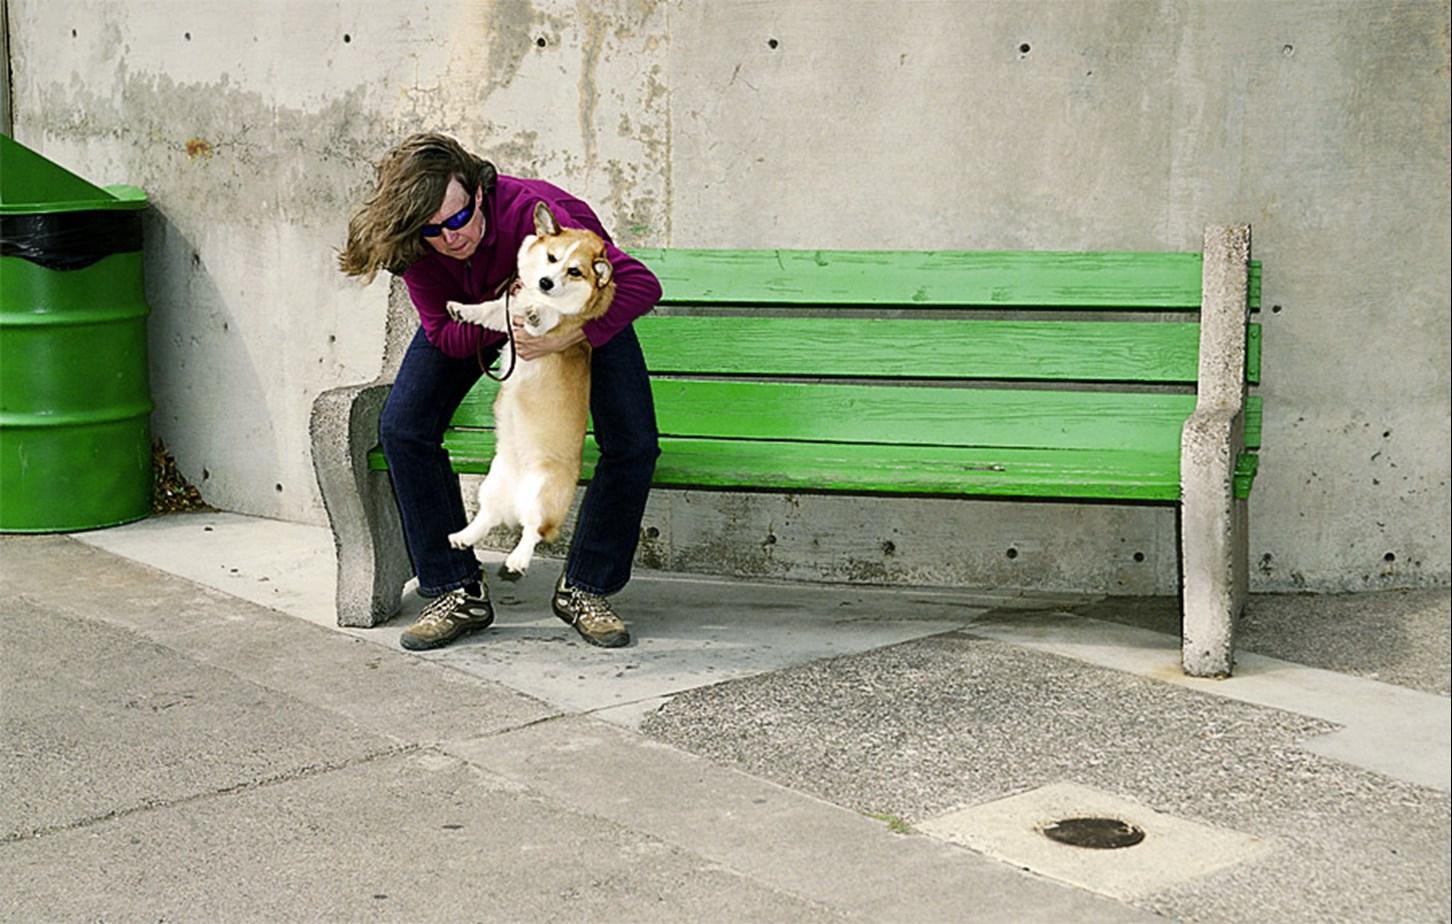 A Woman Hoists A Dog, Duluth, Minnesota, September 2010